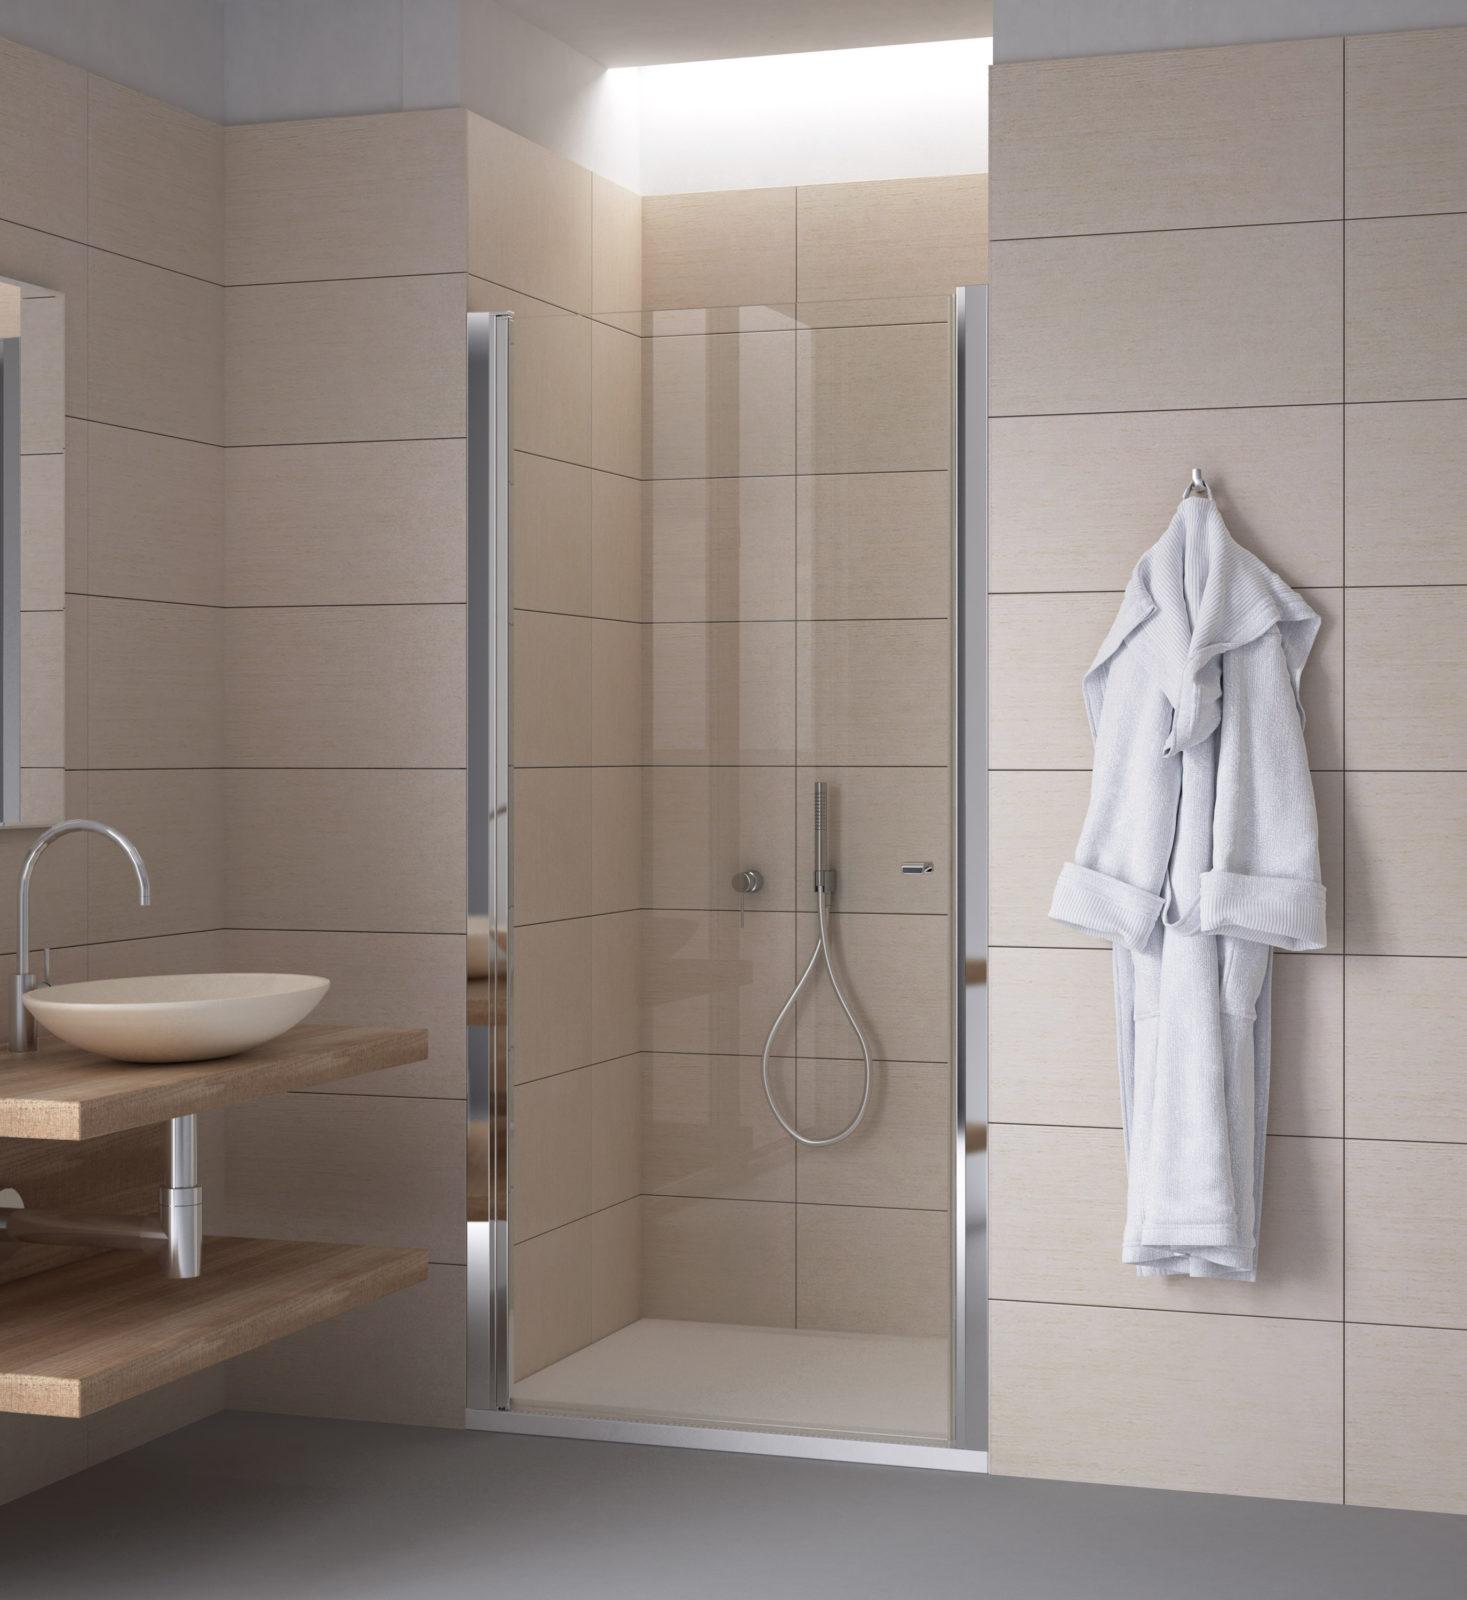 Porte de douche en niche - Calibe